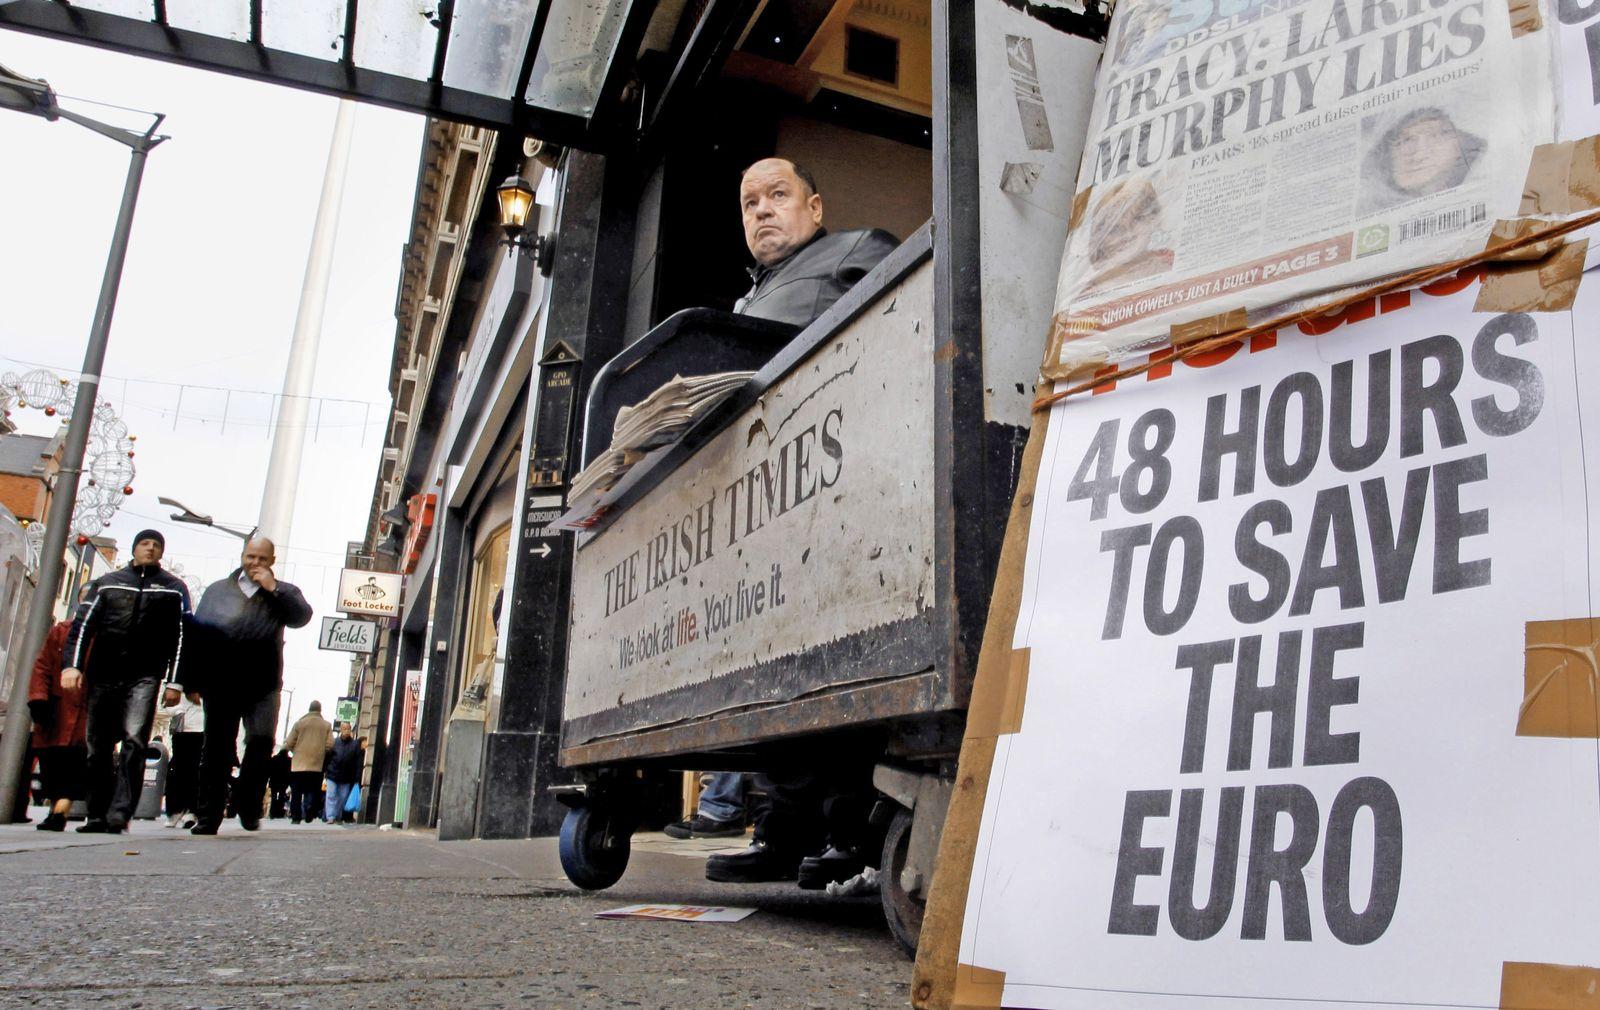 Ireland Europe Financial Crisis